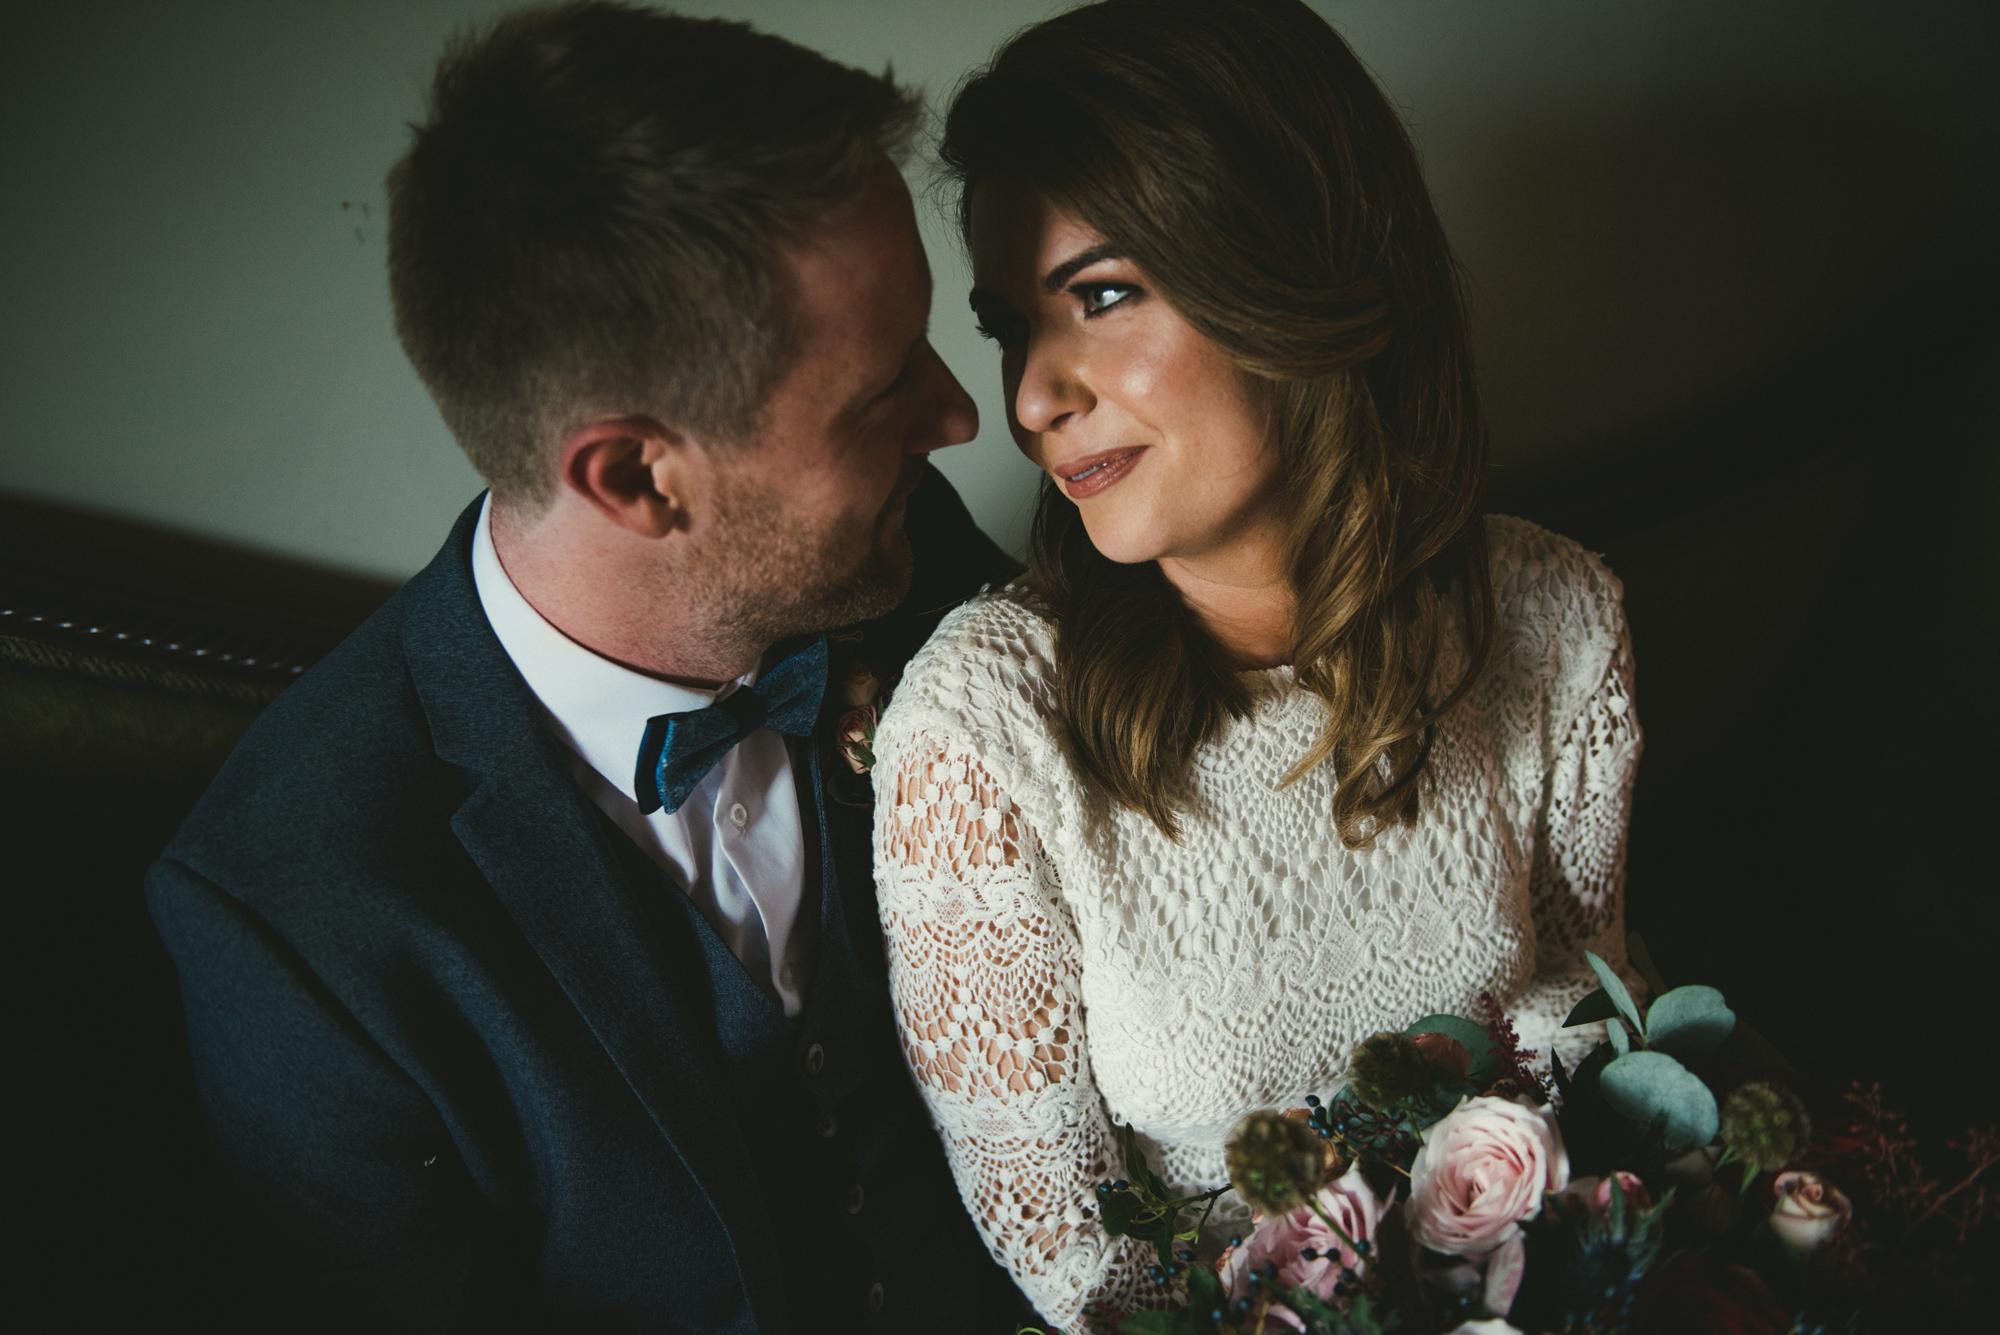 wedding-photographer-northern-ireland-paula-gillespie.jpg